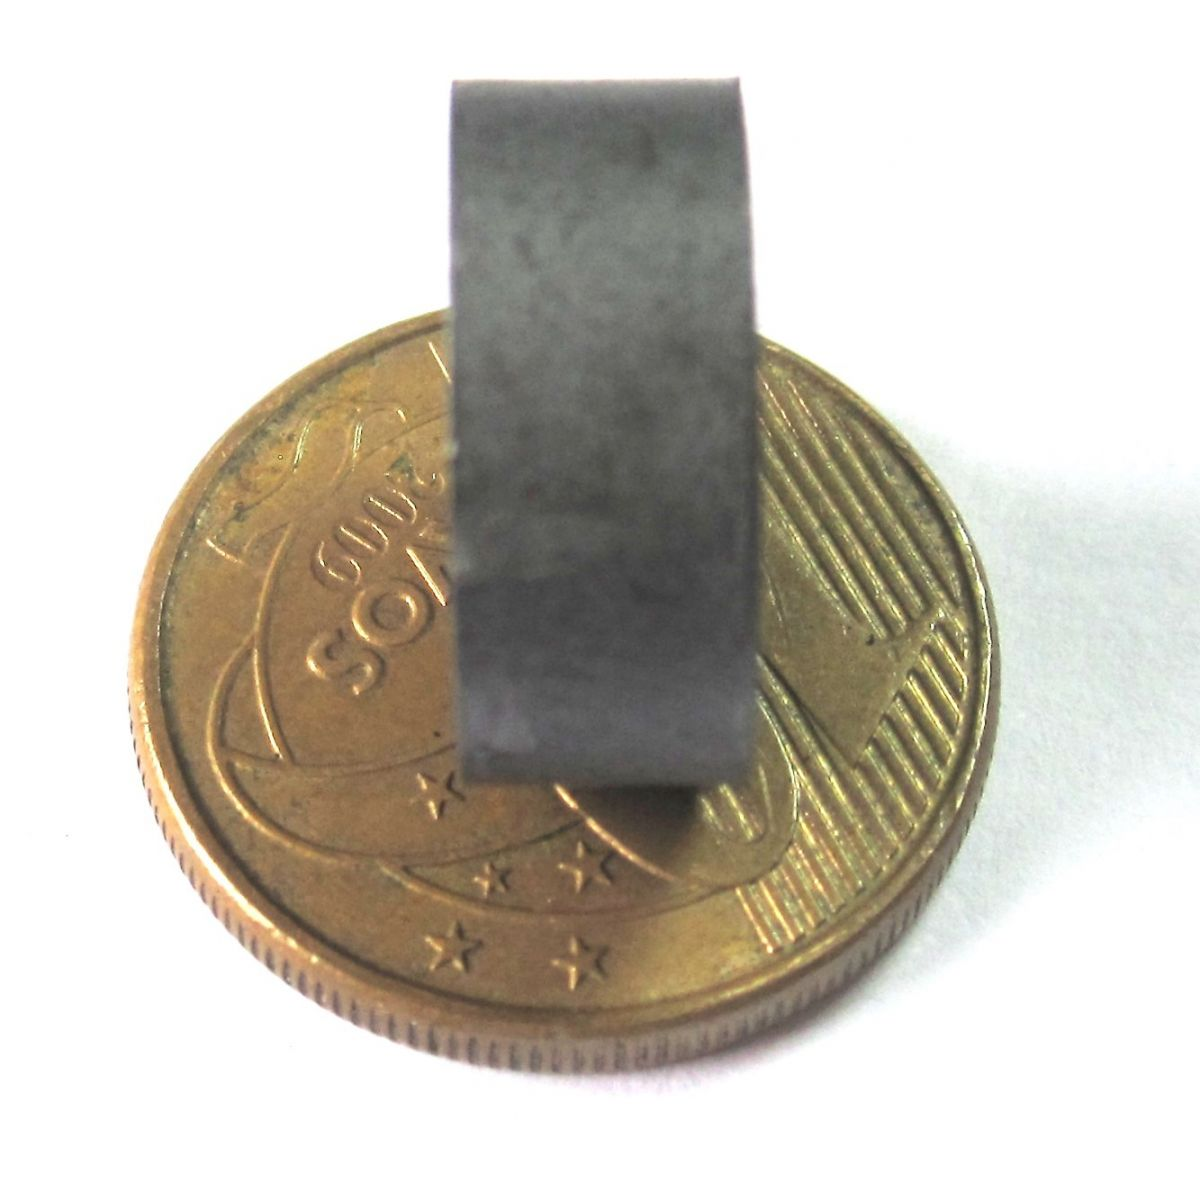 Imã de Ferrite Disco (cerâmica) Y30 15x6 mm  - Polo Magnético